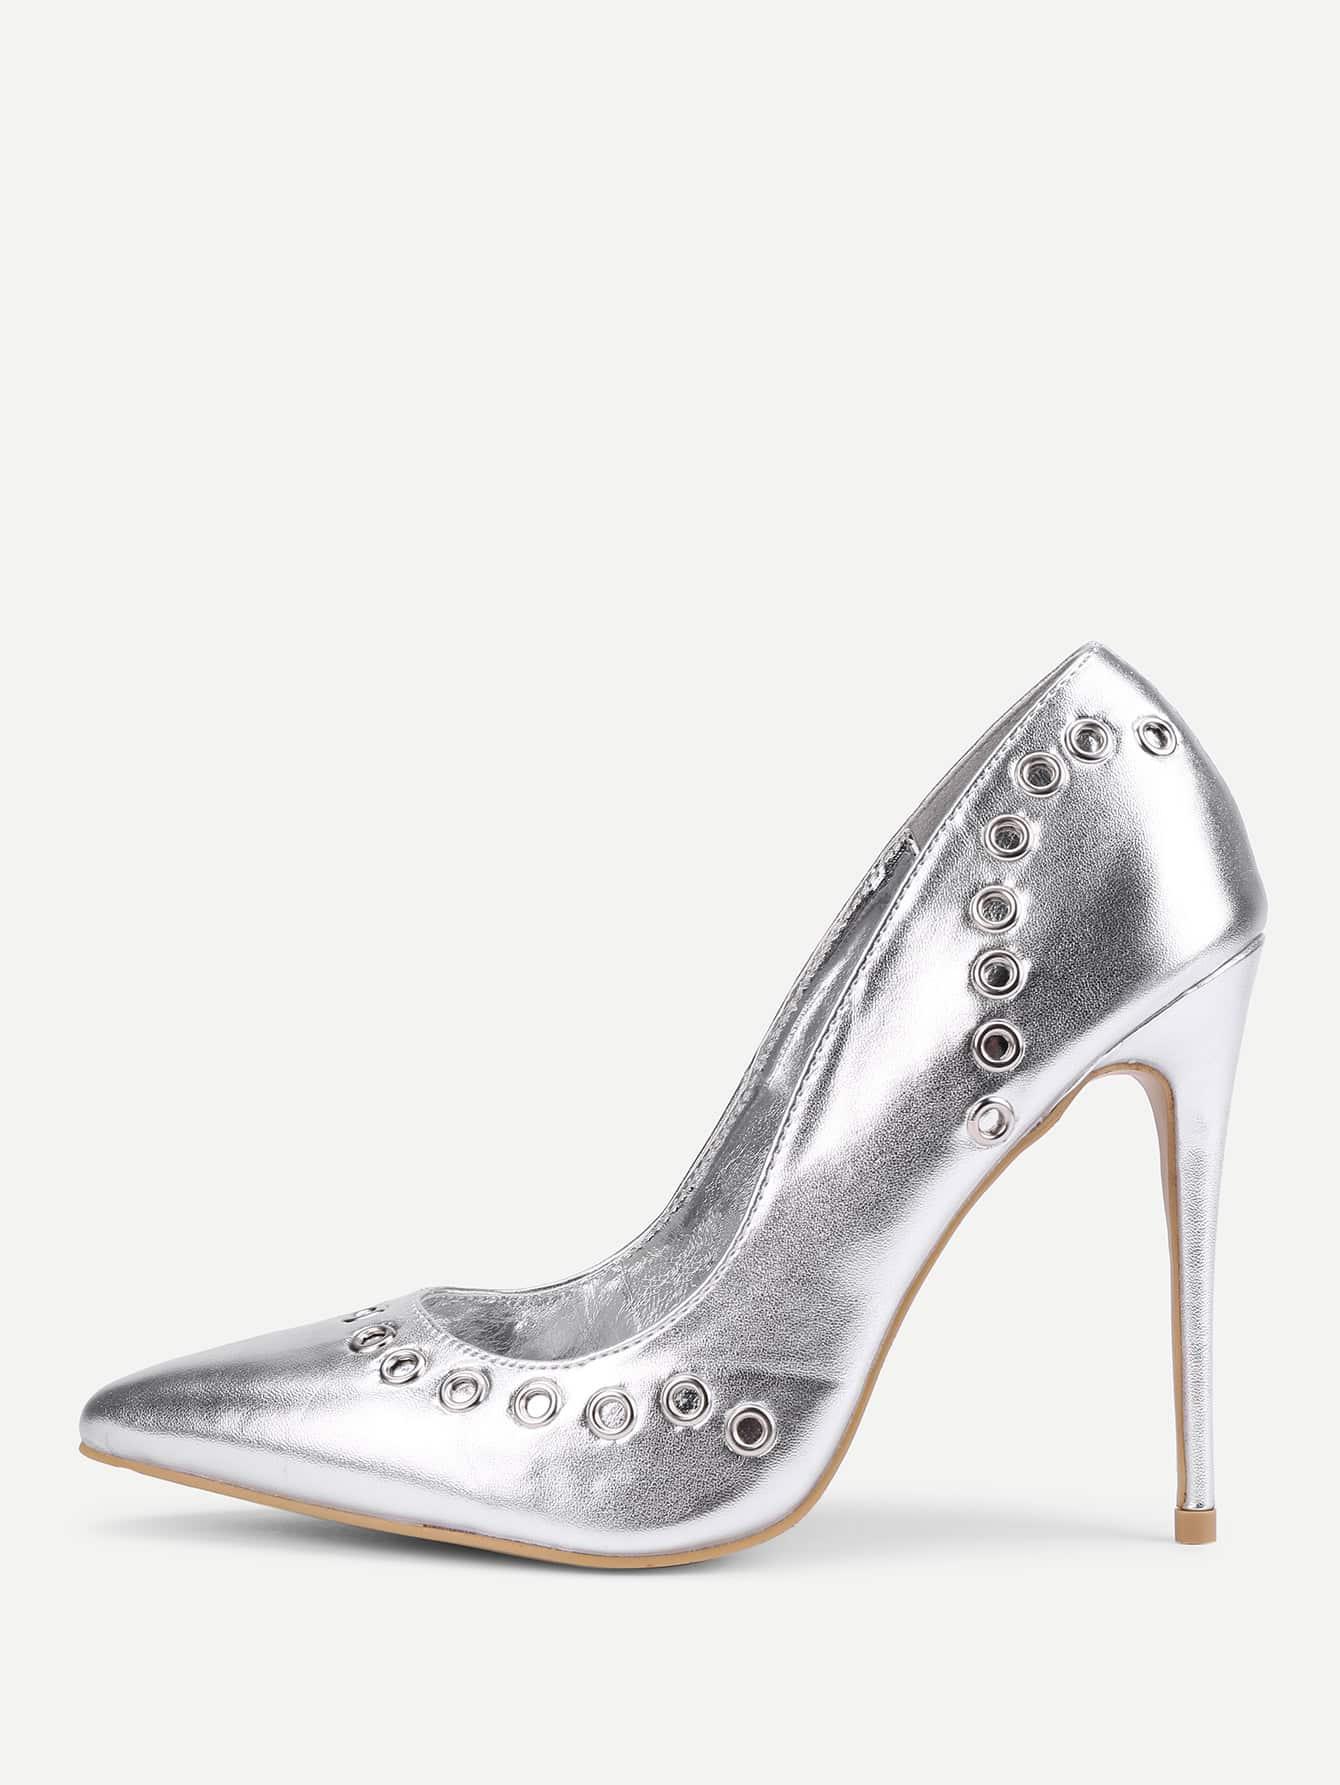 Grommet Design PU Stiletto Heels